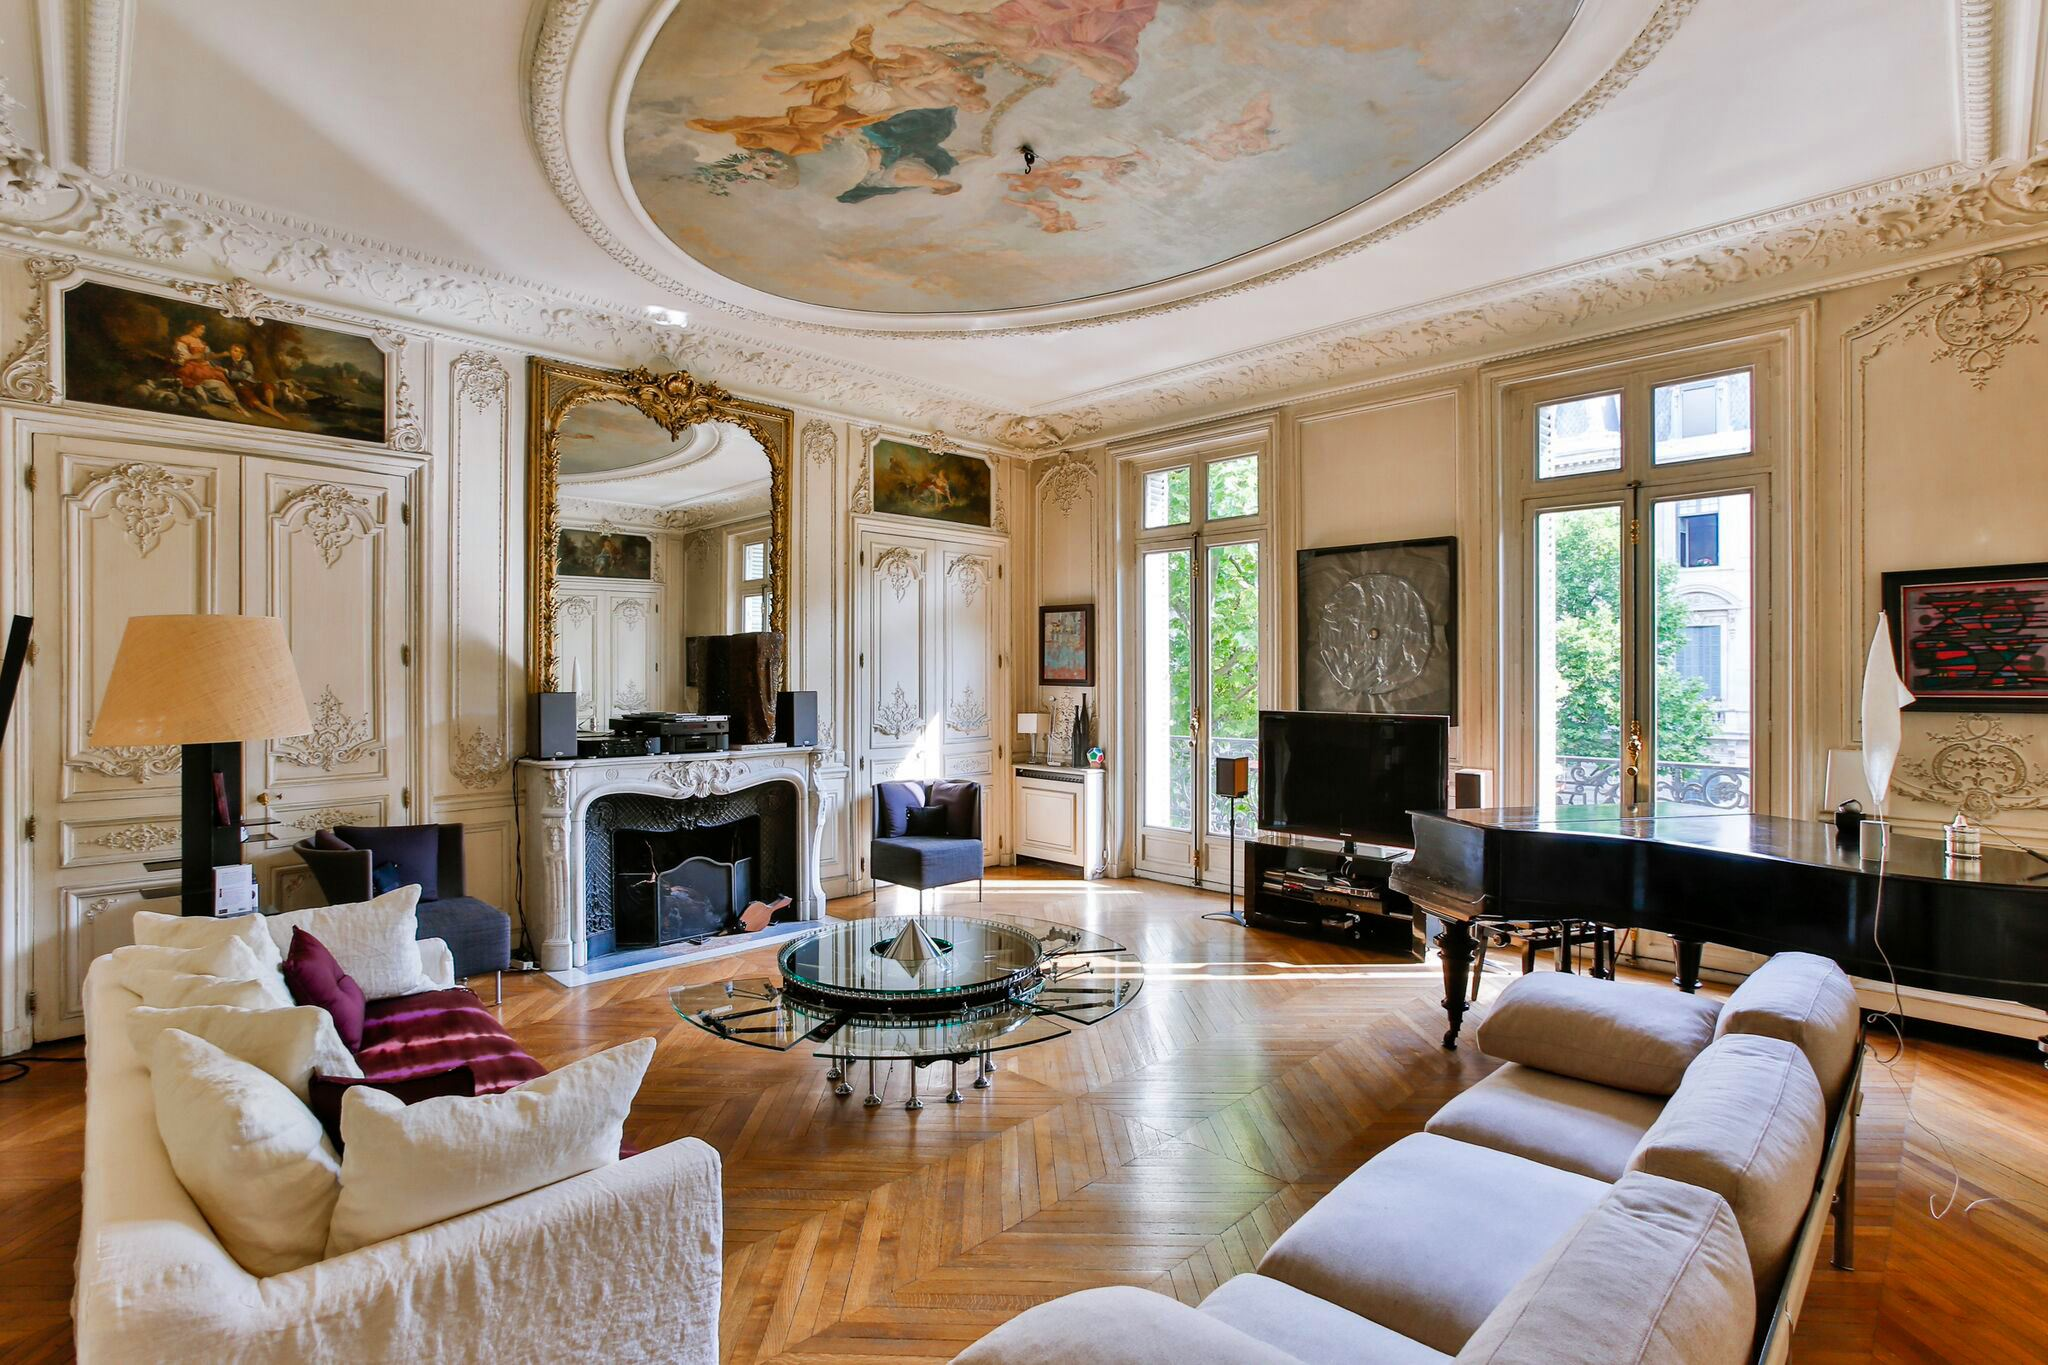 Appartamento per Vendita alle ore Apartment - Monceau - Saint-Augustin Paris, Parigi 75008 Francia